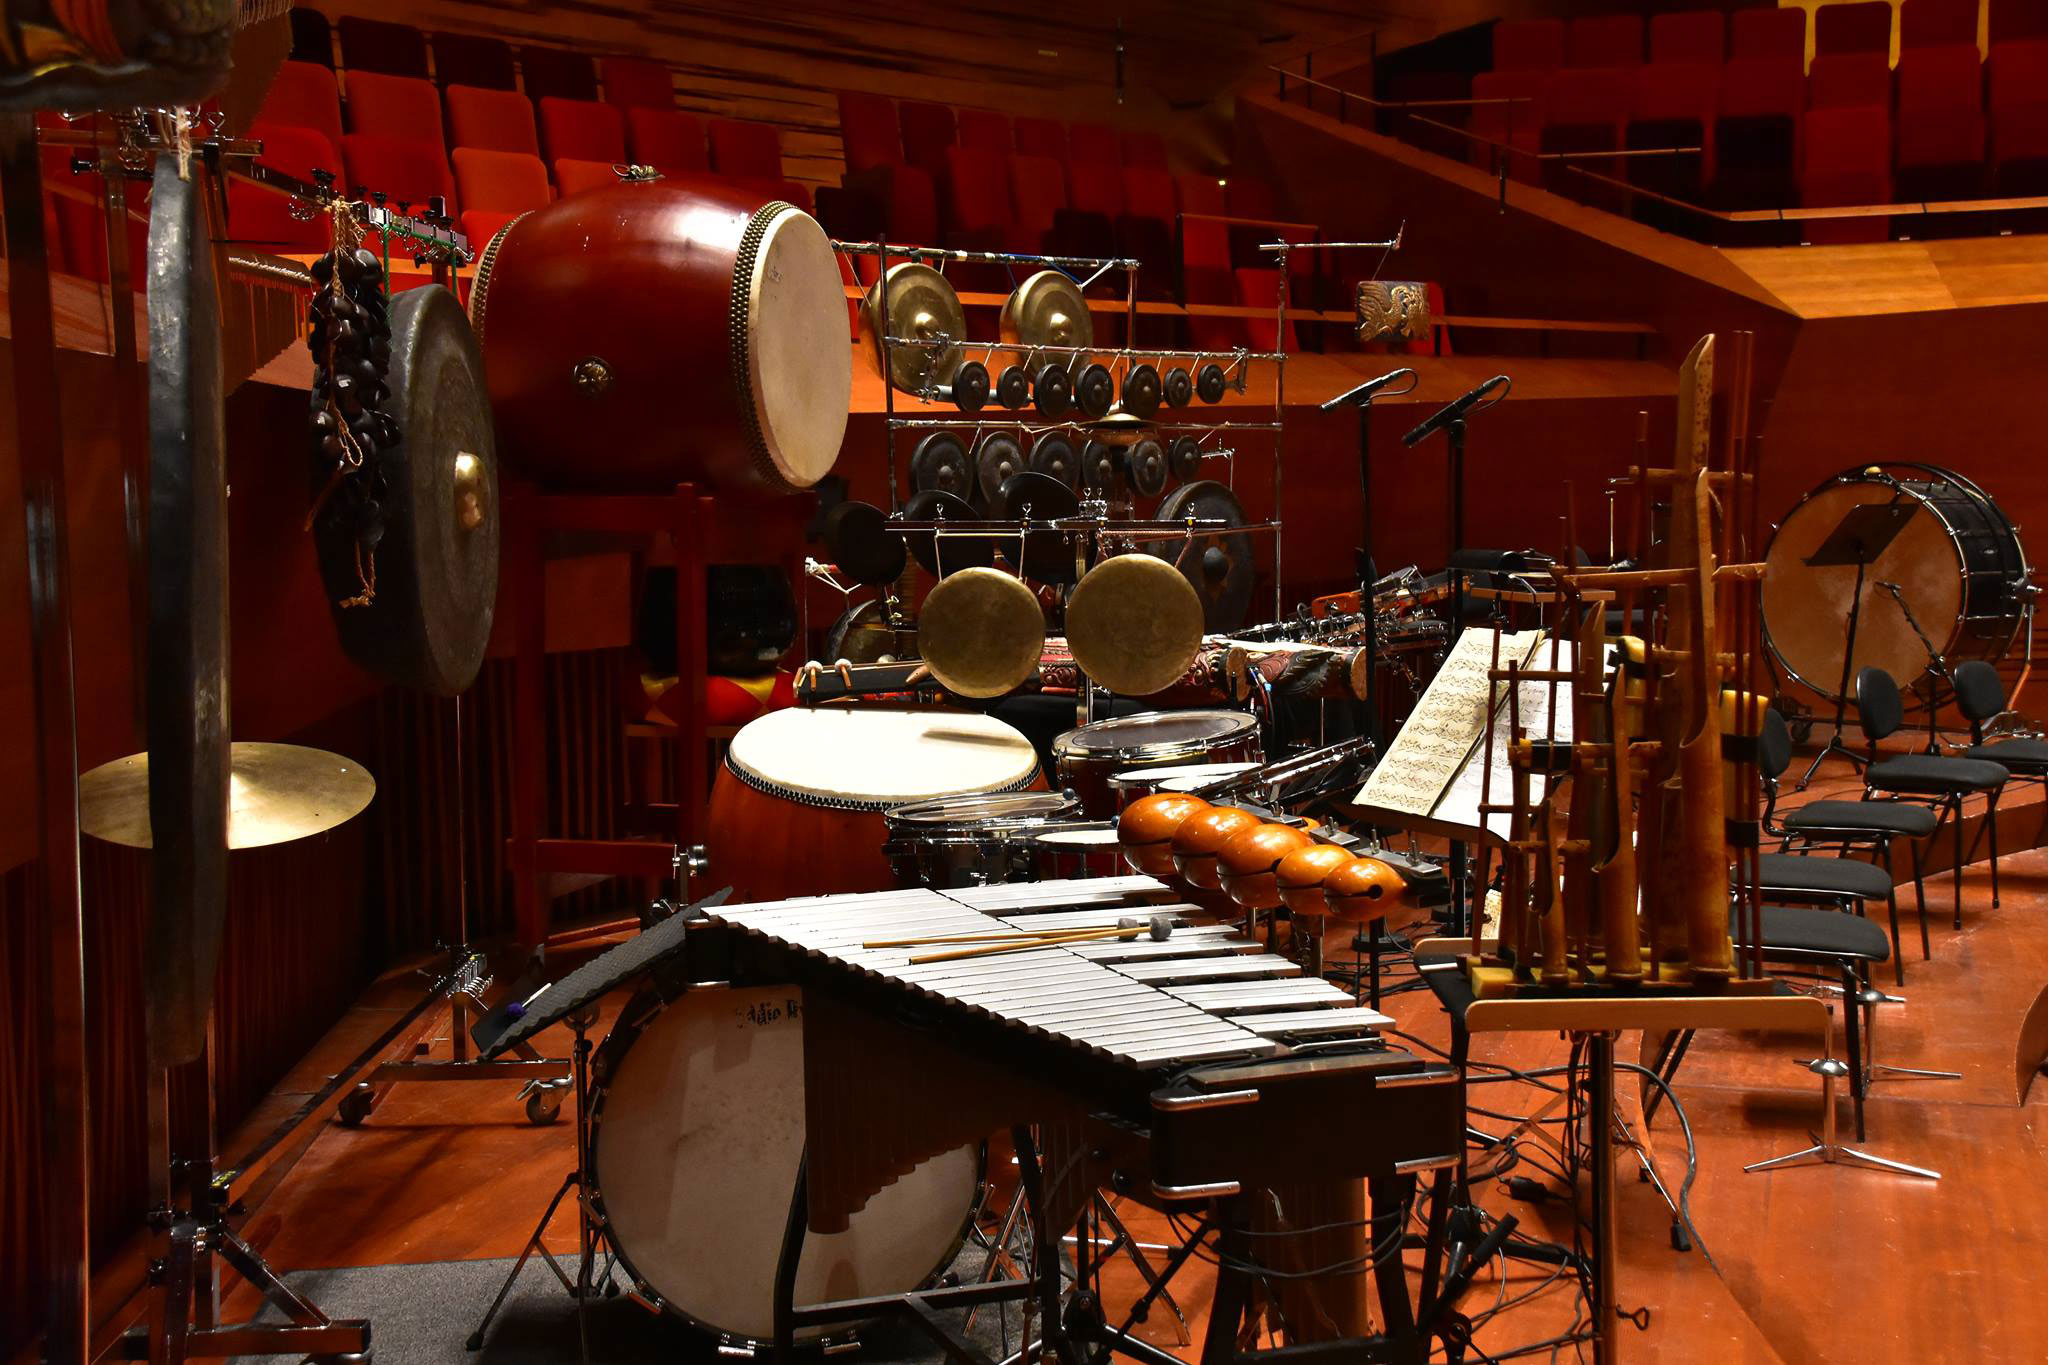 Slagtøj - percussion